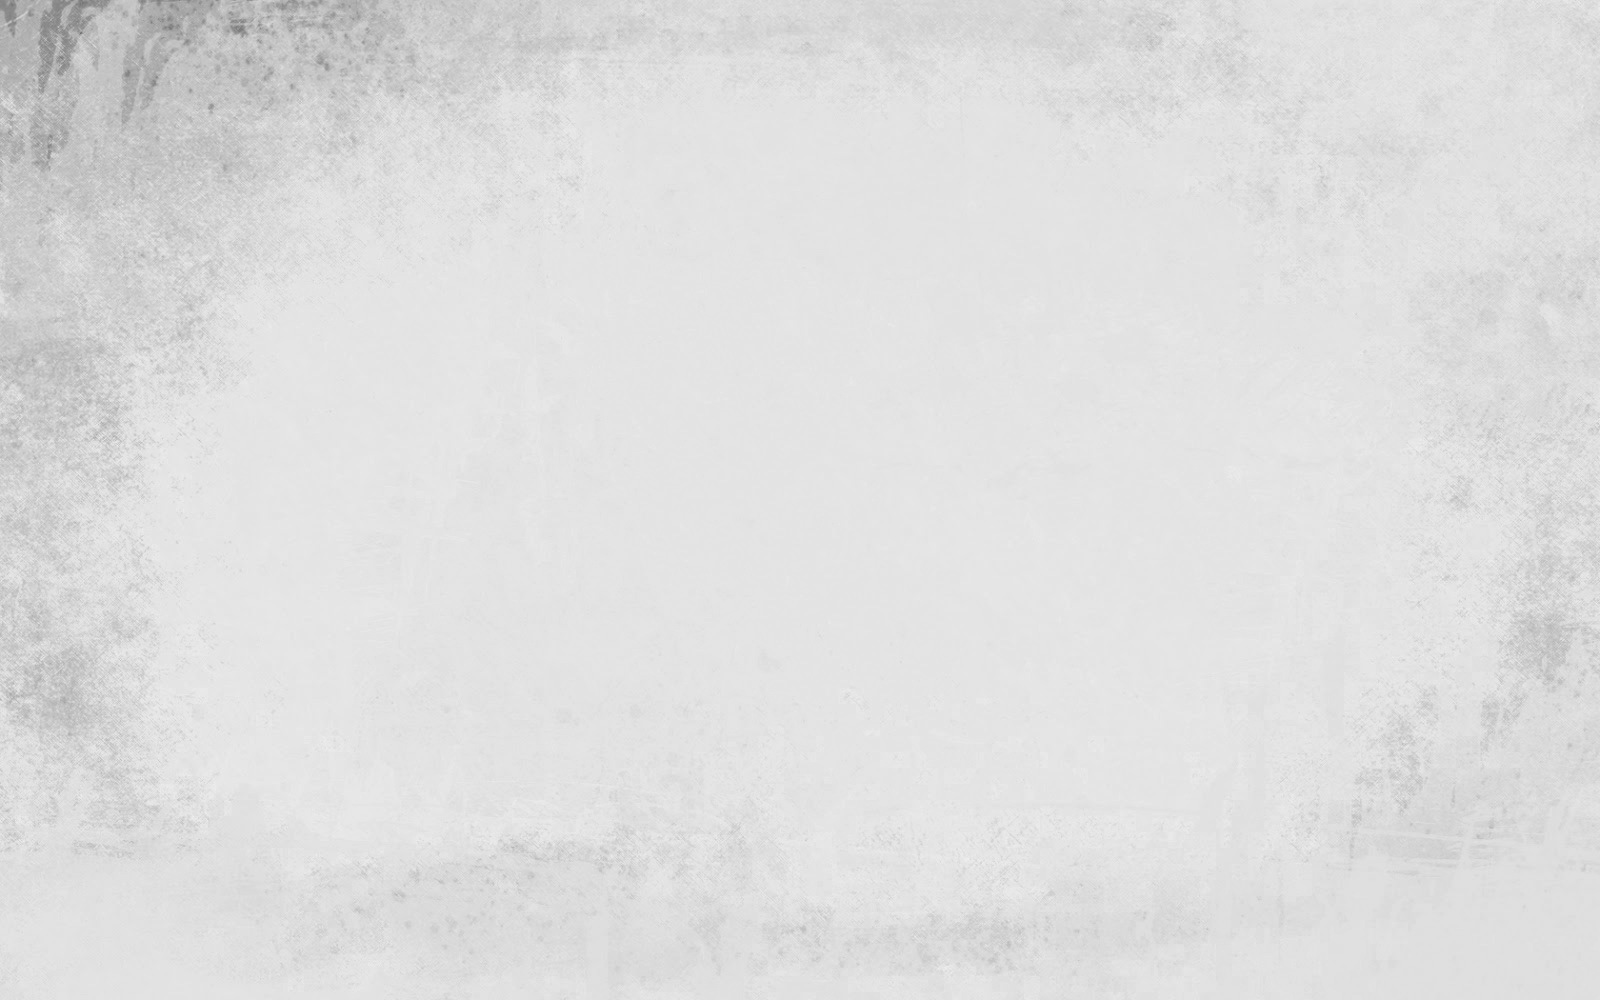 grey background tumblr - photo #21